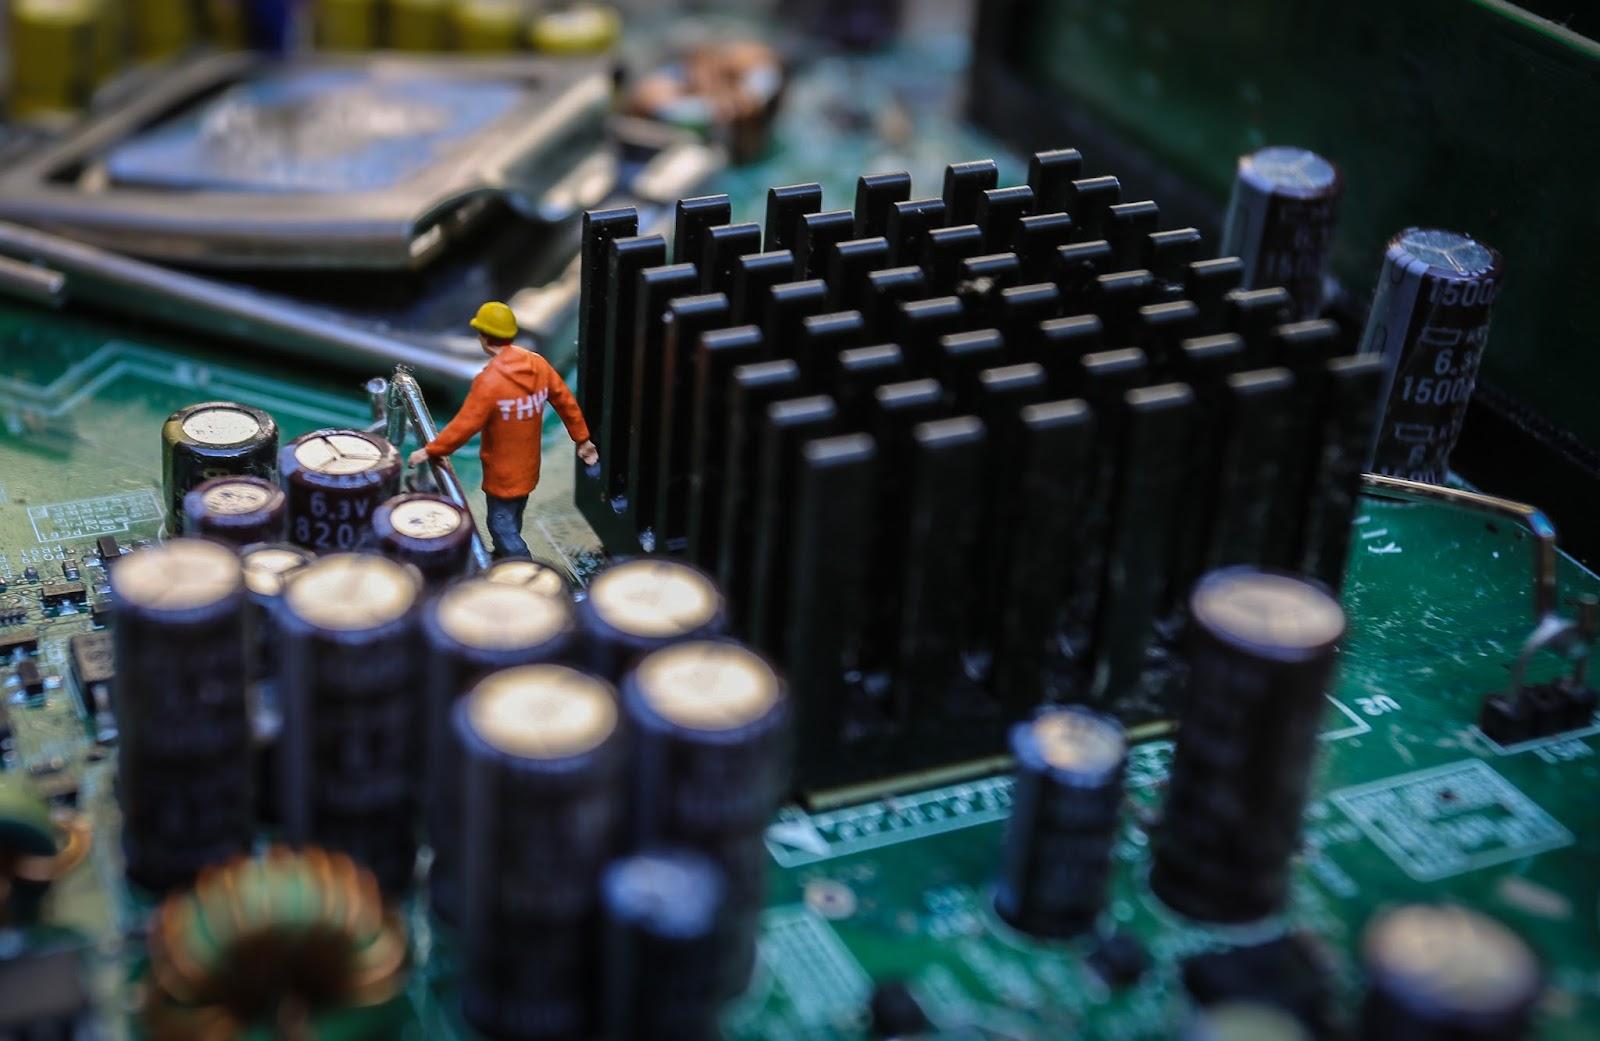 Computer-7510.jpg